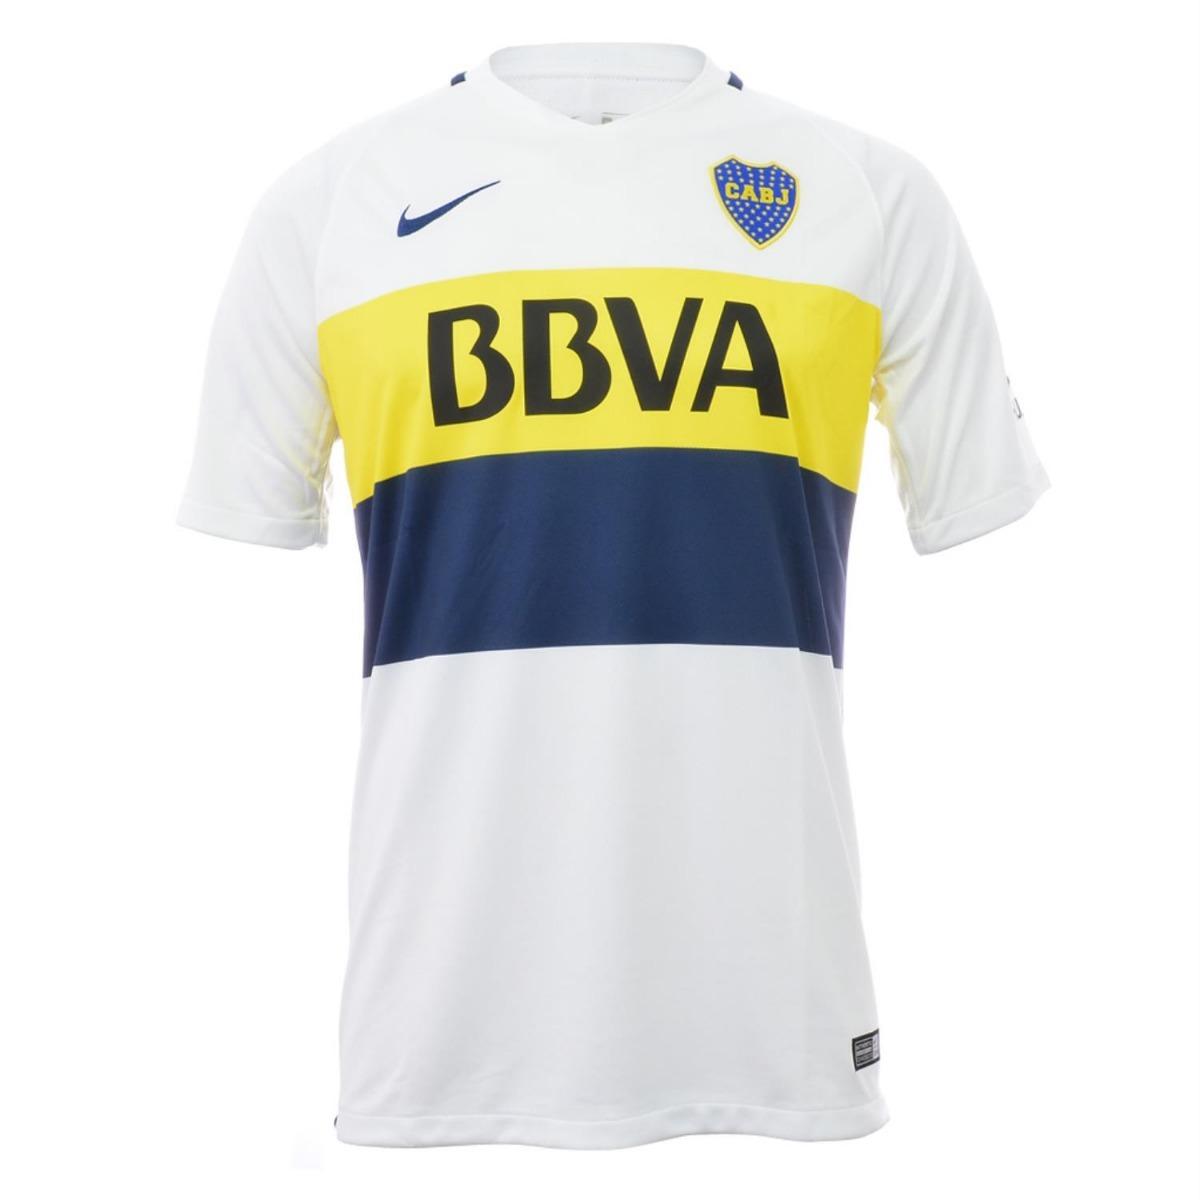 00 Suplente Boca Camiseta En Original 1 Blanca 2017 500 Nike Jr UzwwP